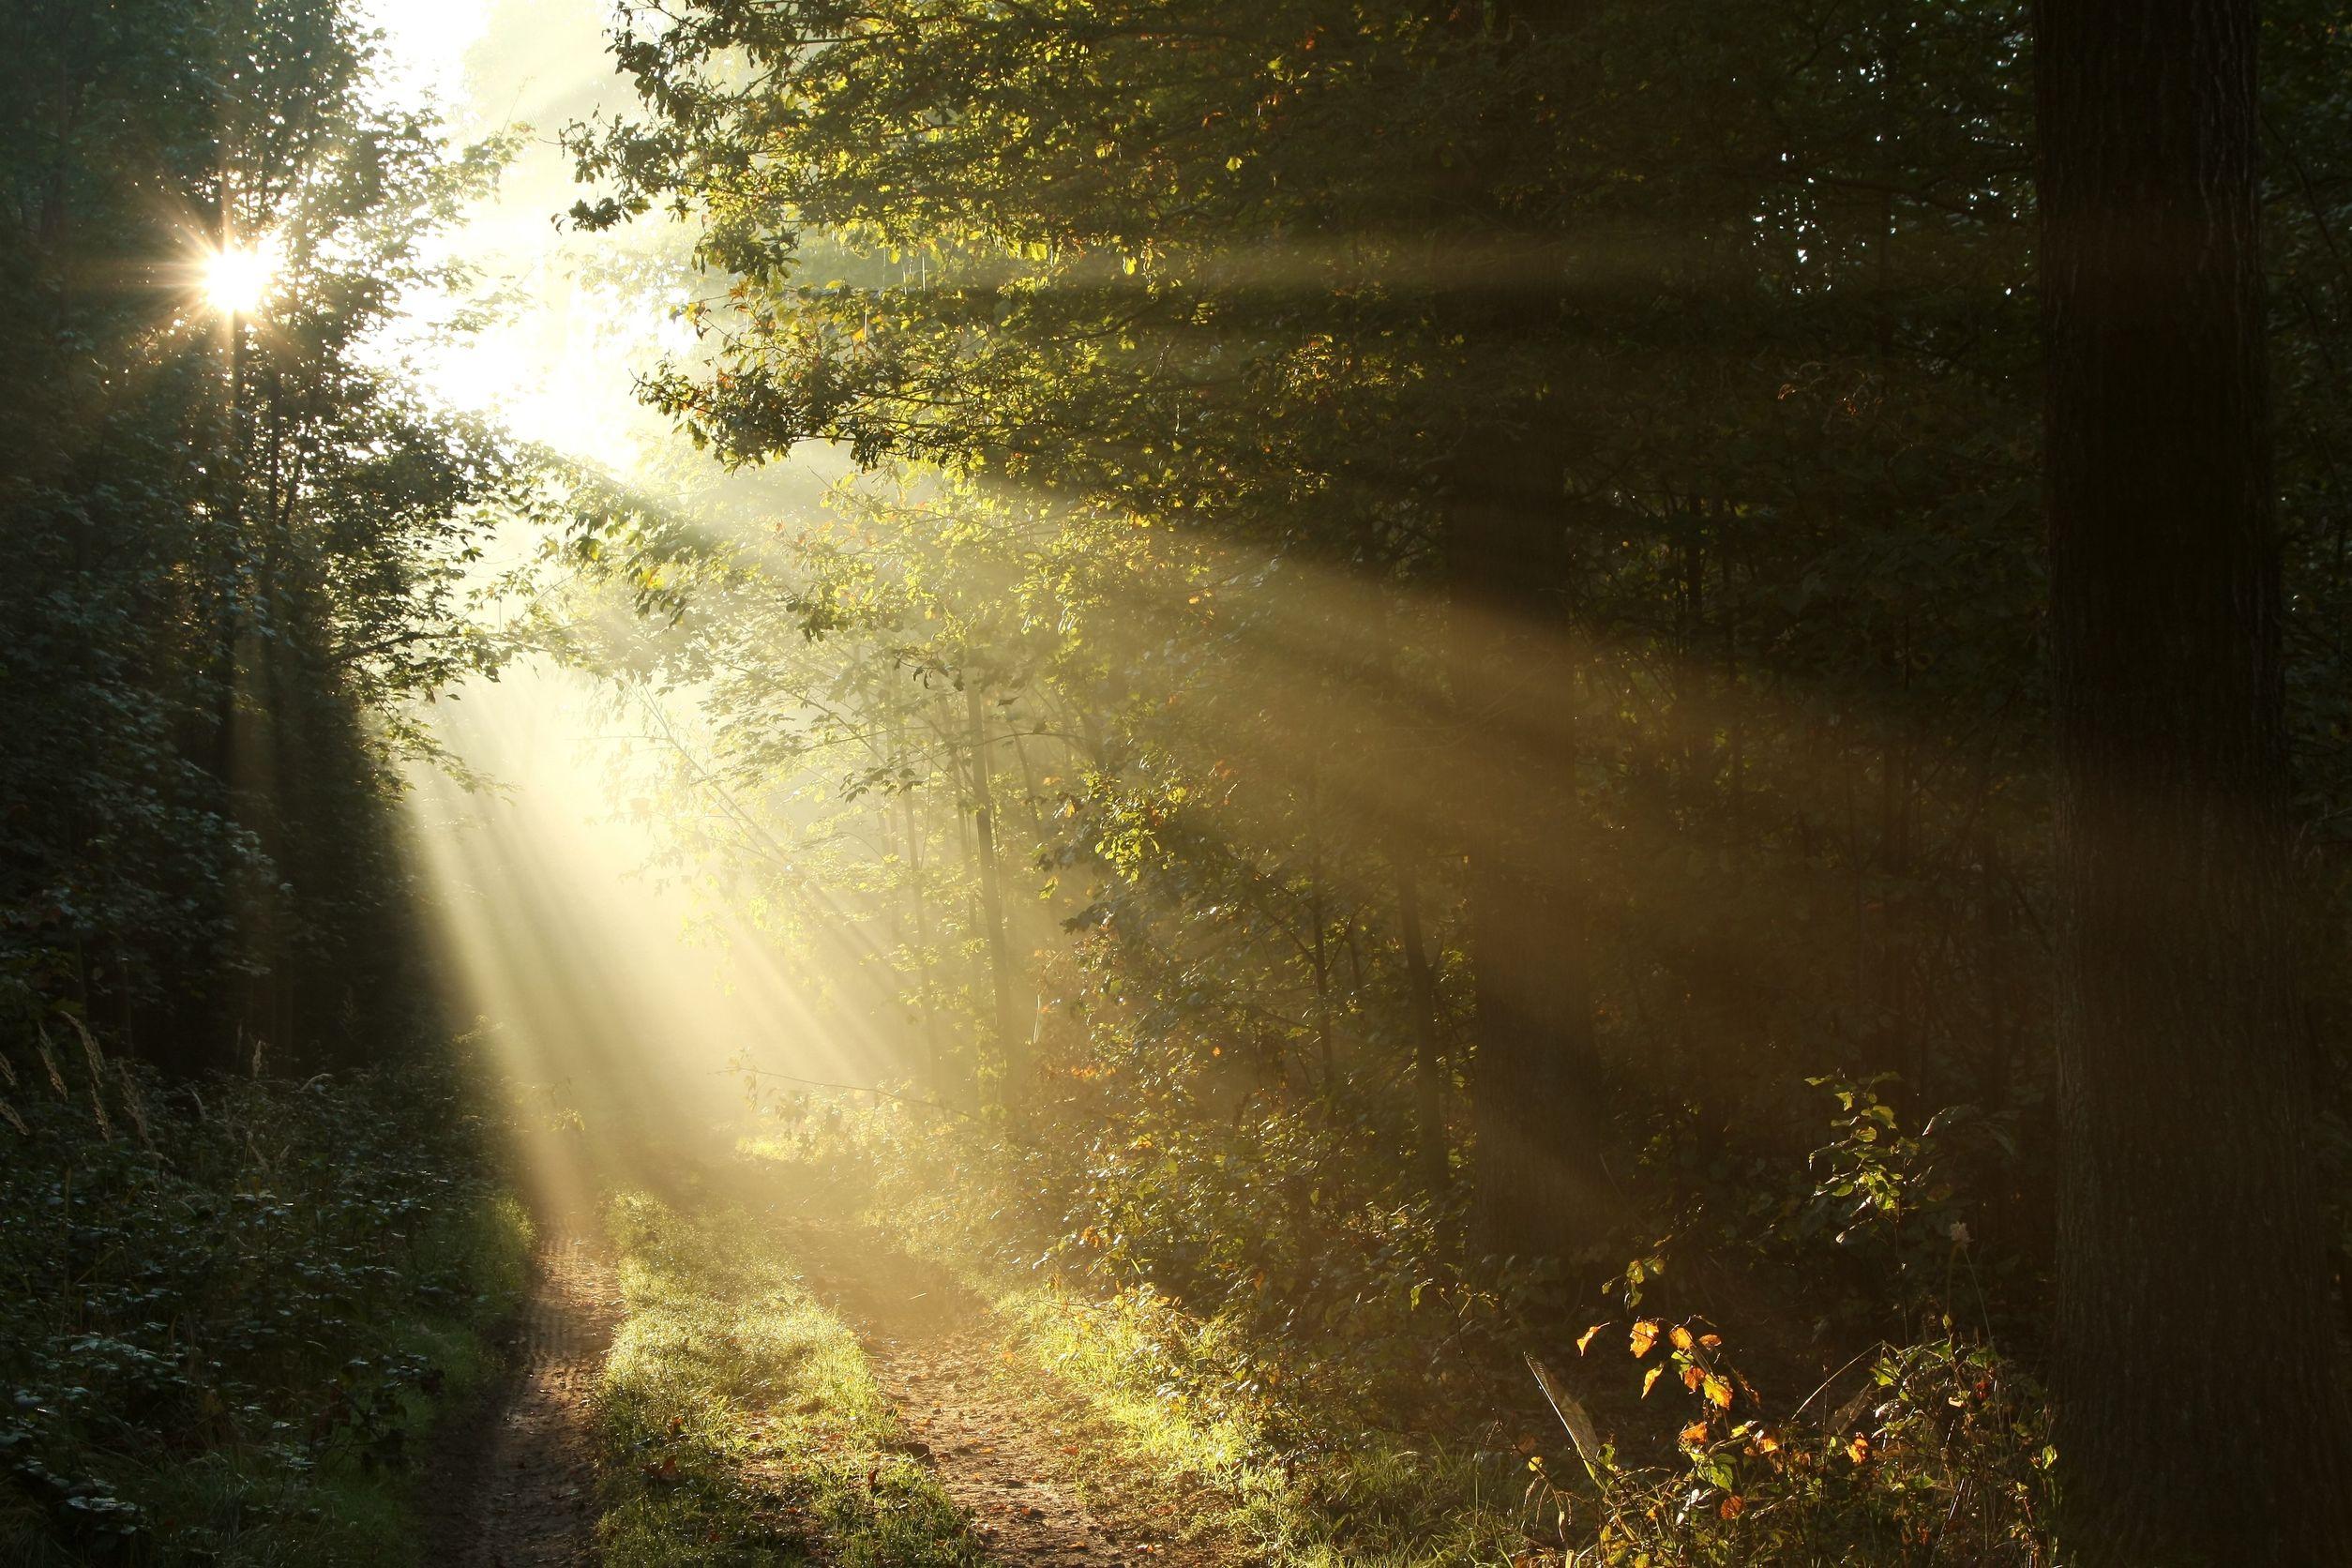 Keyhole-Light-through-trees-dirt-road